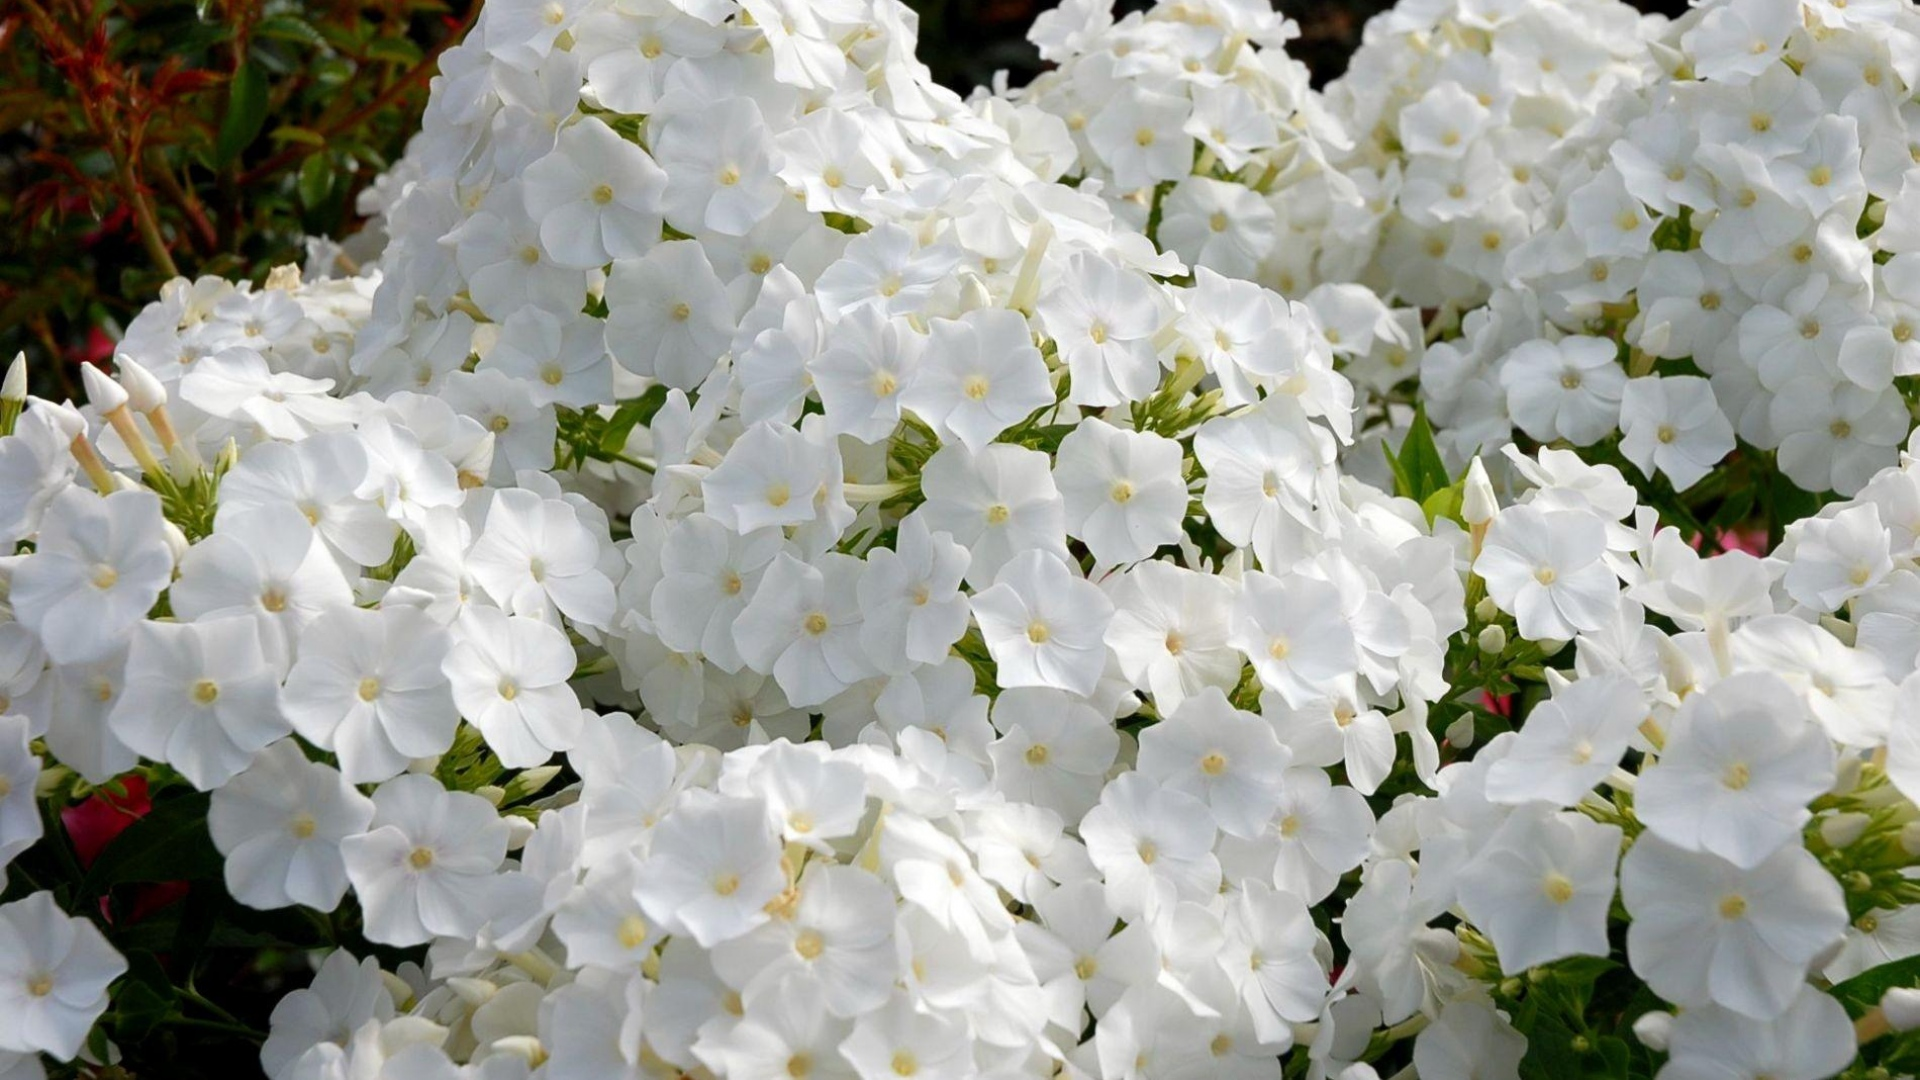 Download wallpaper 1920x1080 phlox flowers white garden phlox flowers white mightylinksfo